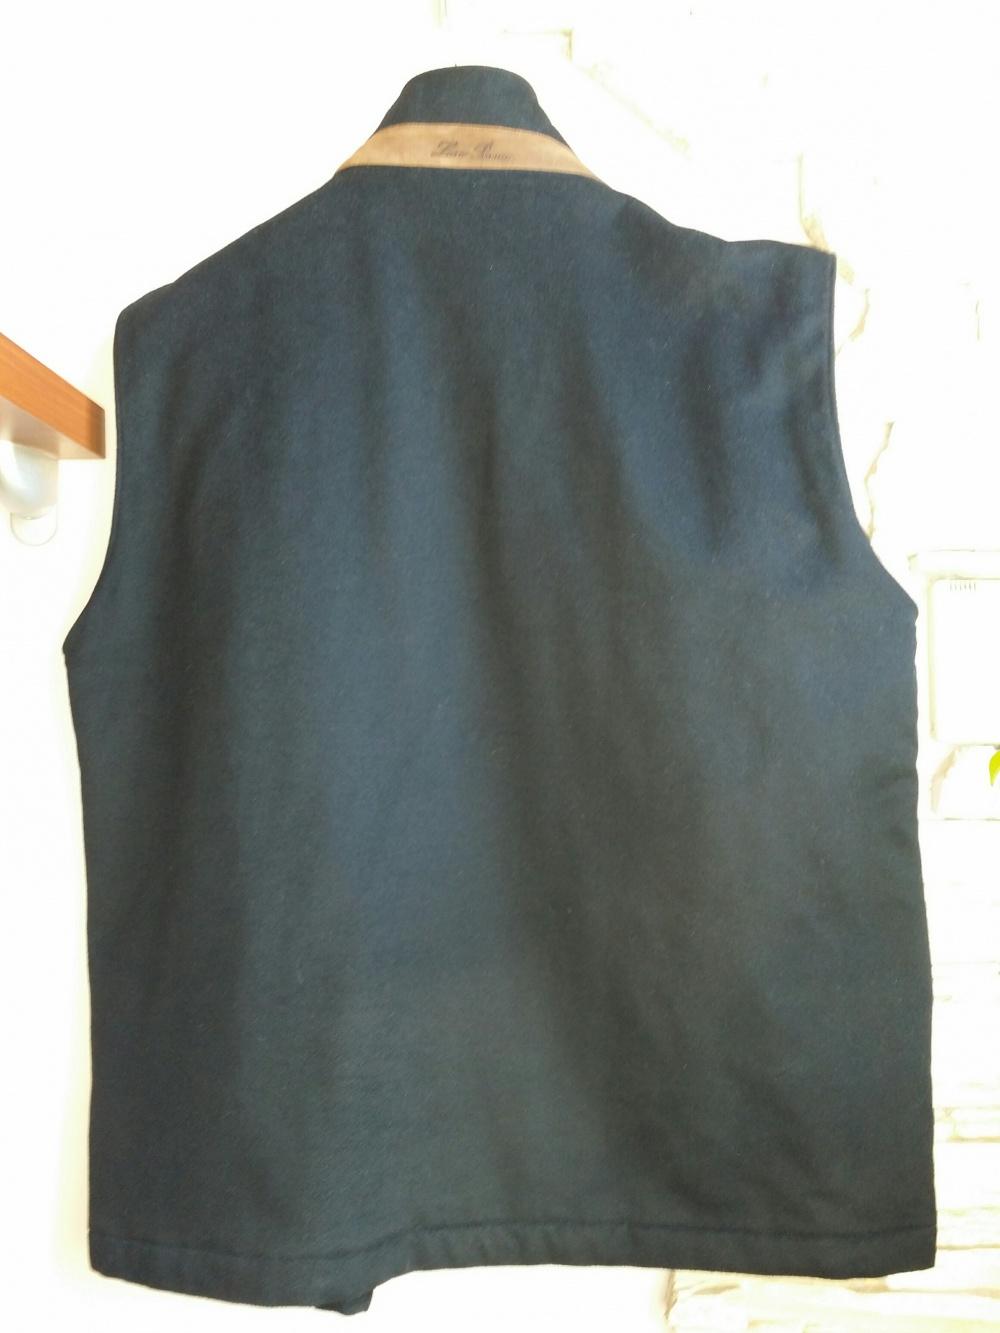 Жилет  Loro piana , размер 50-52